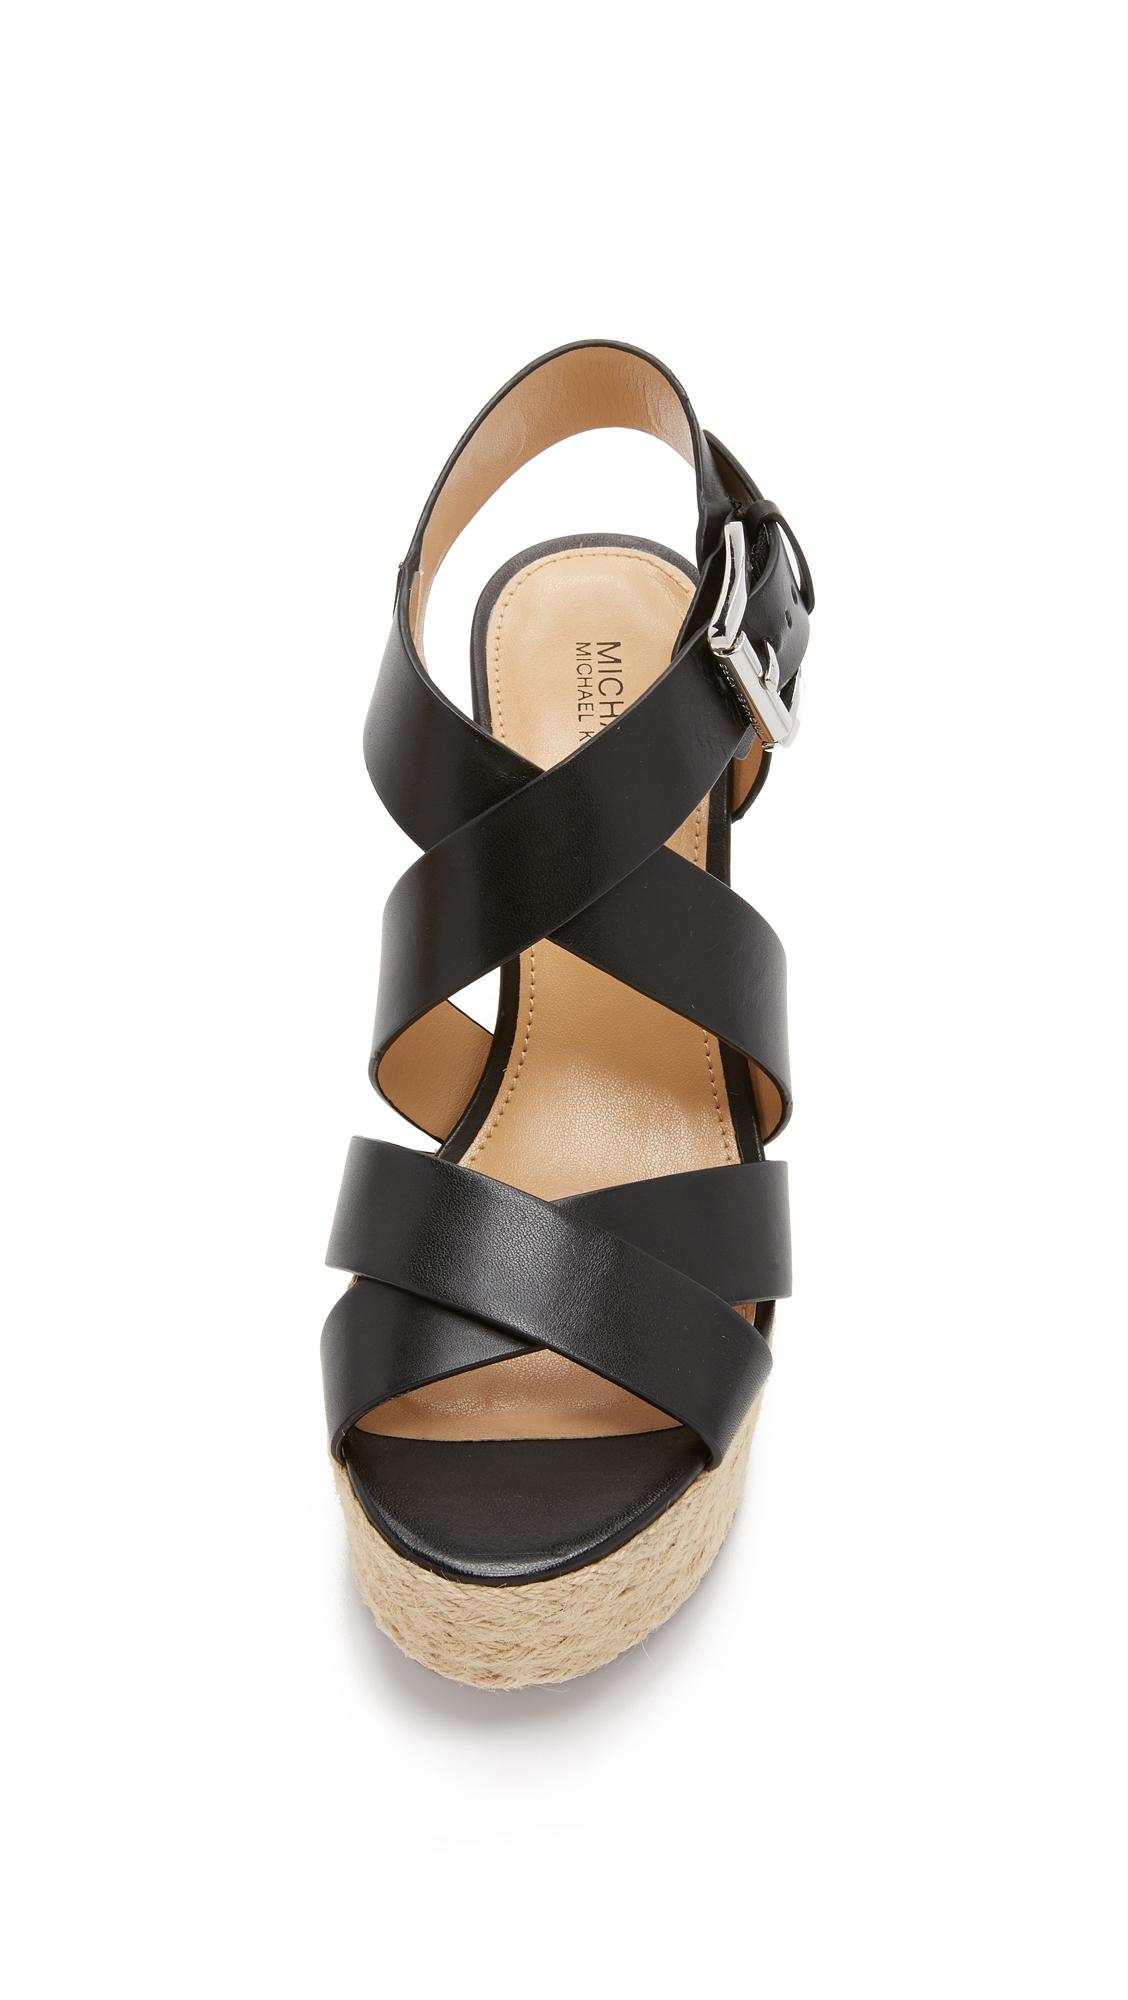 9abf8304a7 MICHAEL Michael Kors Celia Wedge Sandals | SHOPBOP